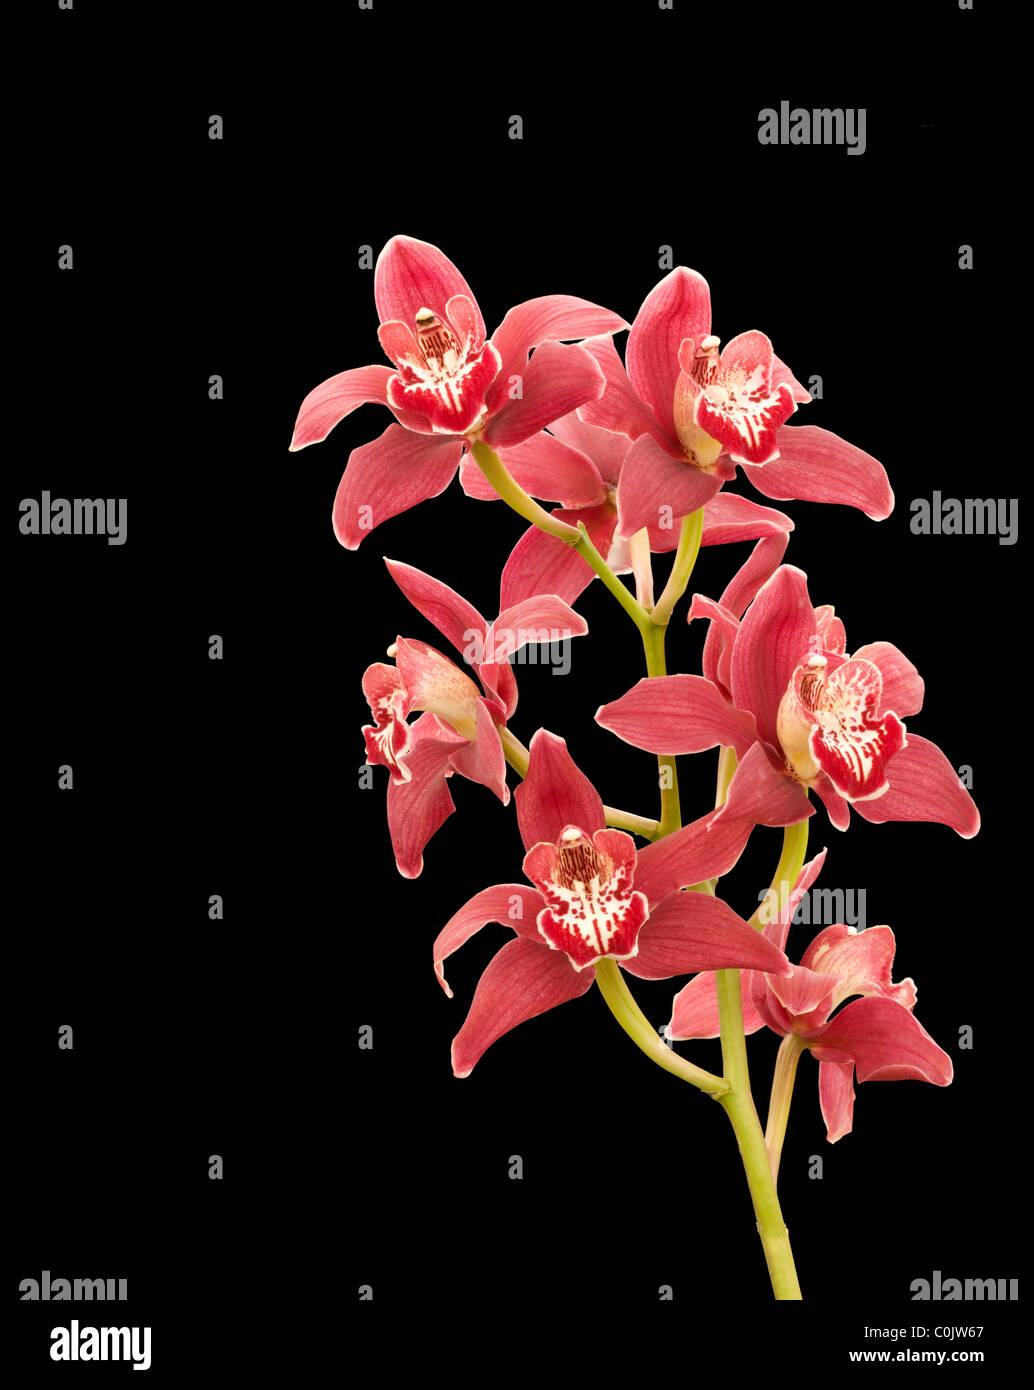 Victor cymbidium orchids against black background - Stock Image